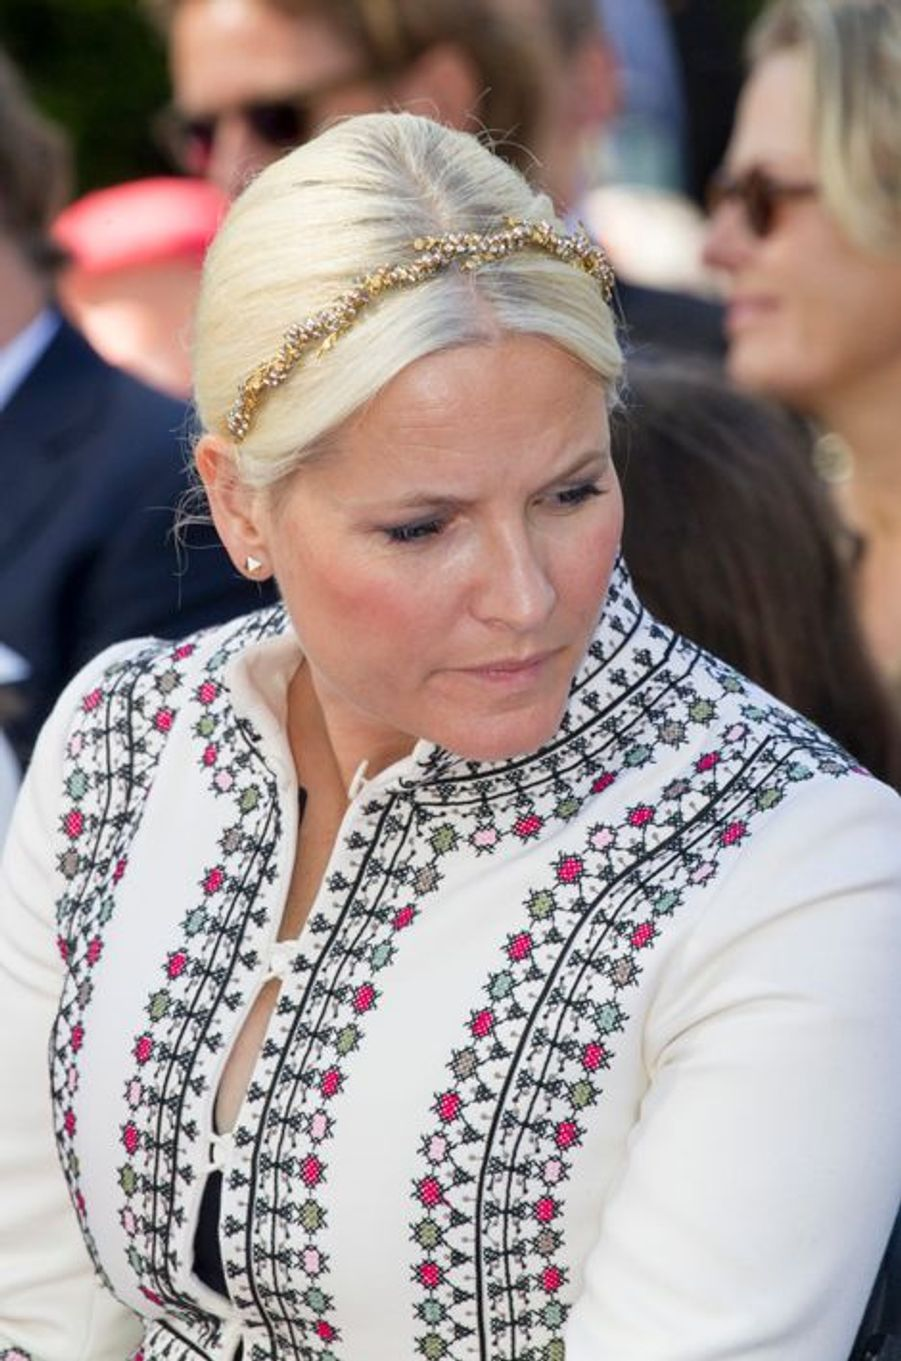 La princesse Mette-Marit de Norvège, à Oslo le 7 juin 2015